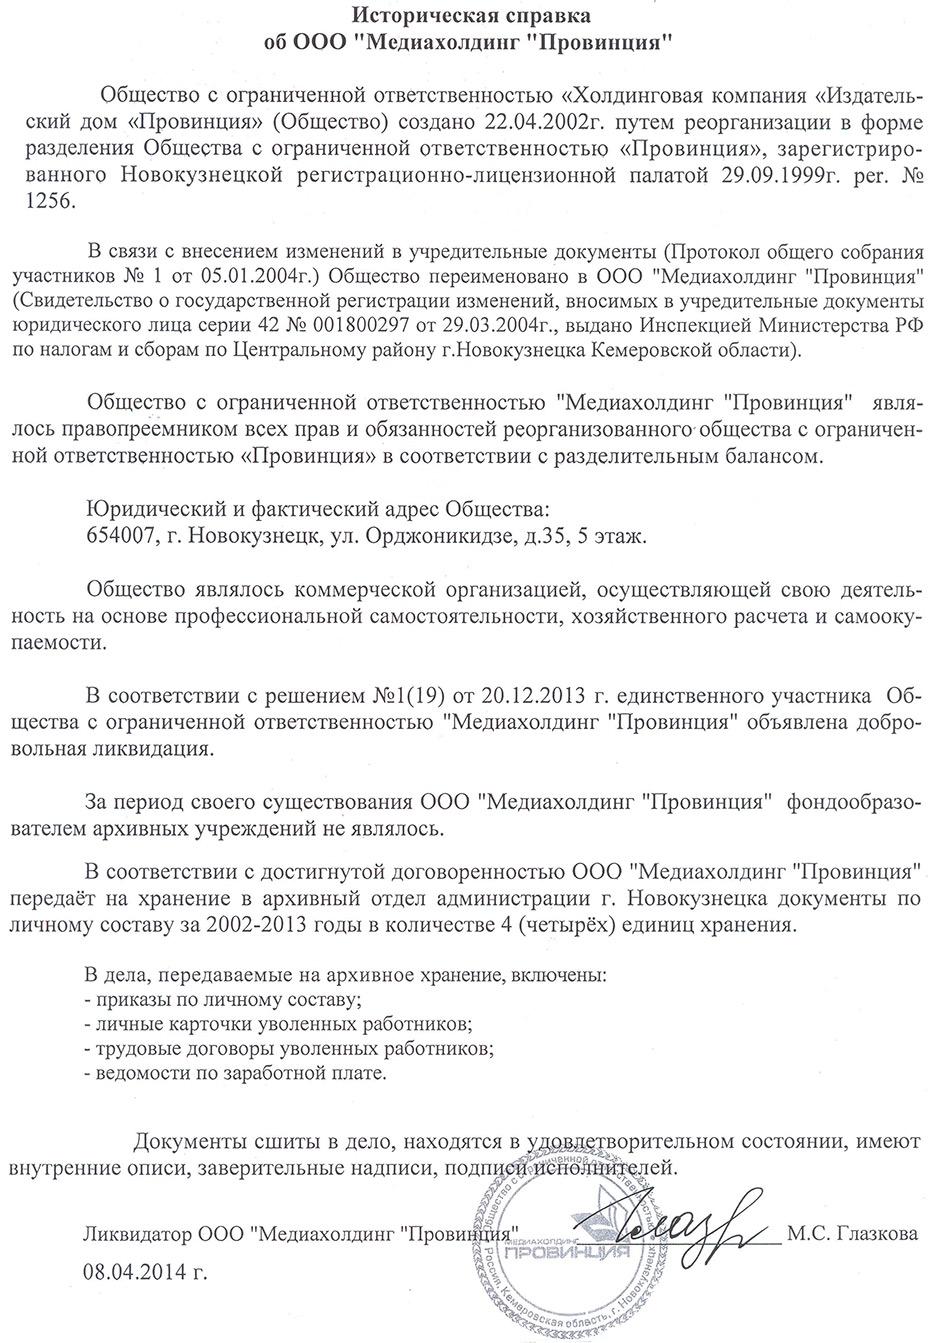 ООО «Медиахолдинг «Провинция»